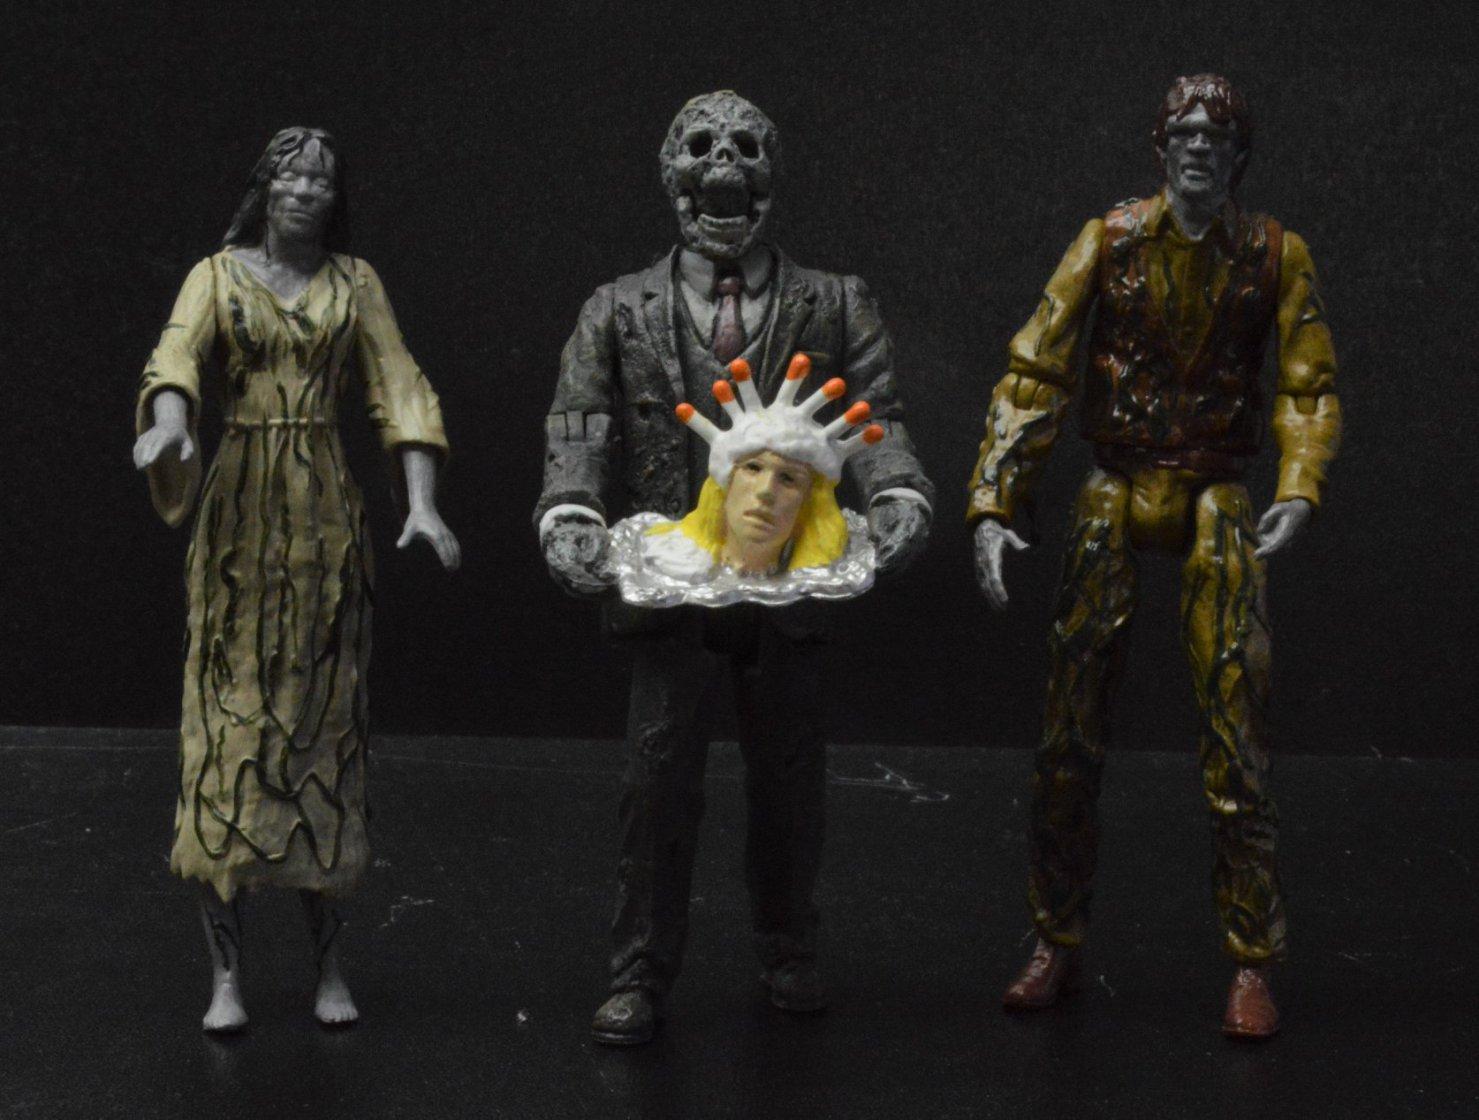 Creepshow Figurines Amok Time